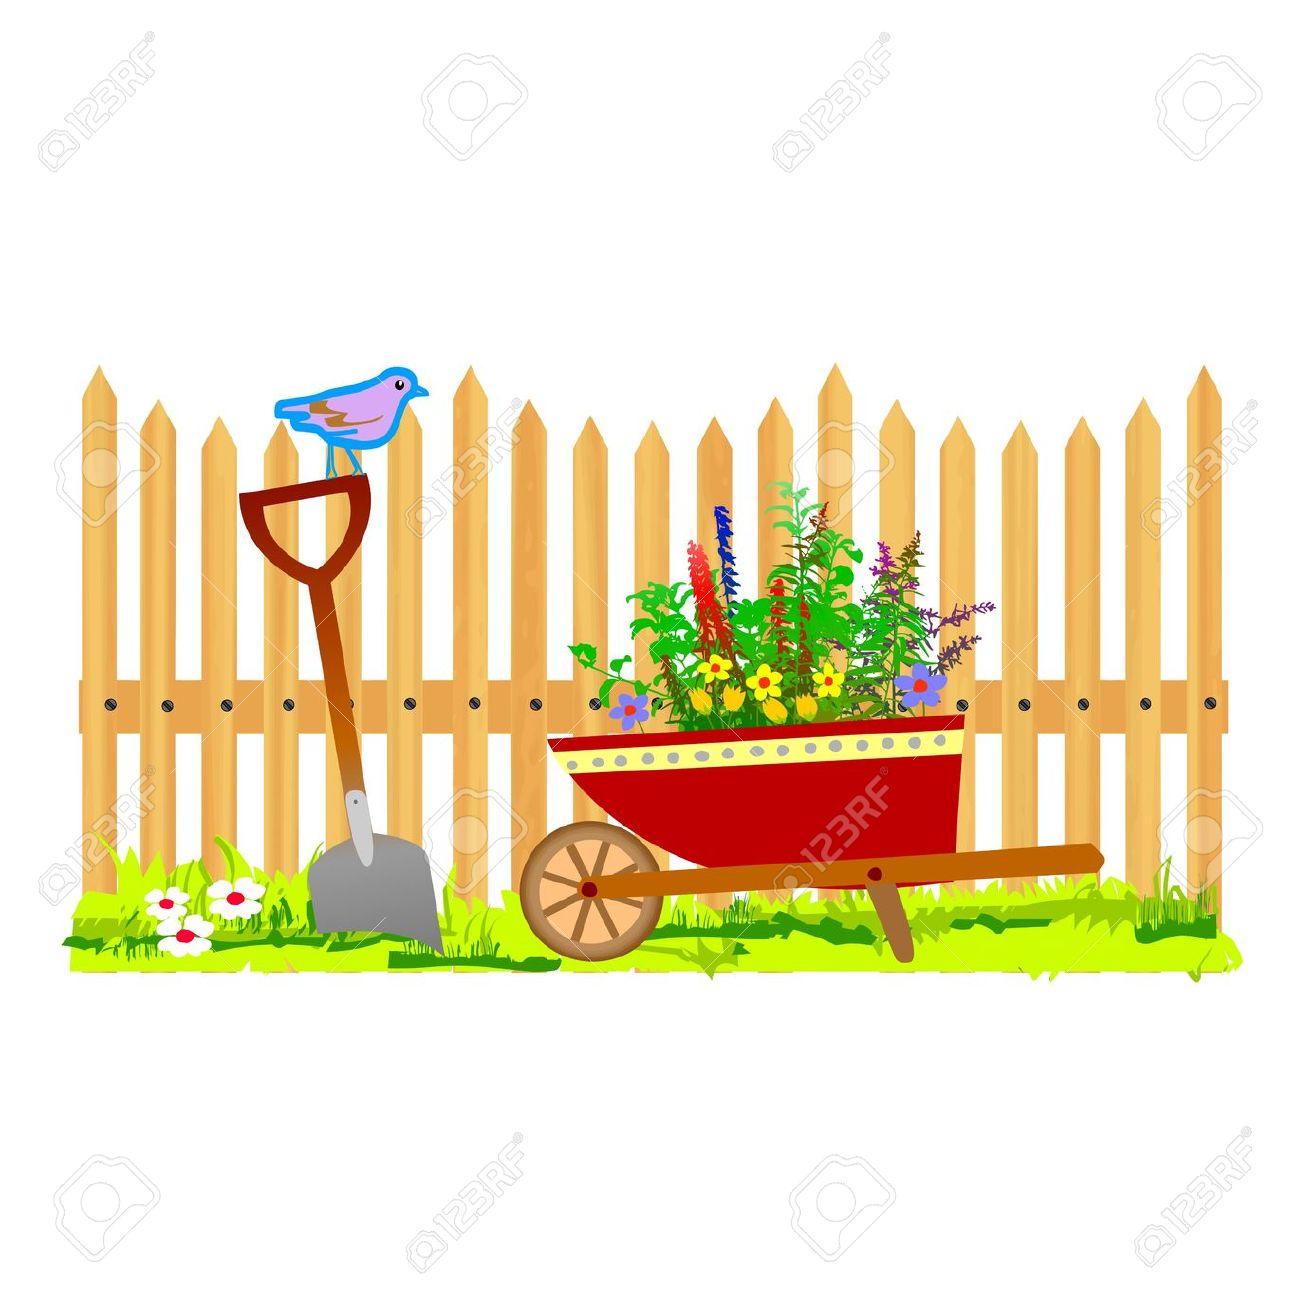 Garden Fence Clipart Clipart.